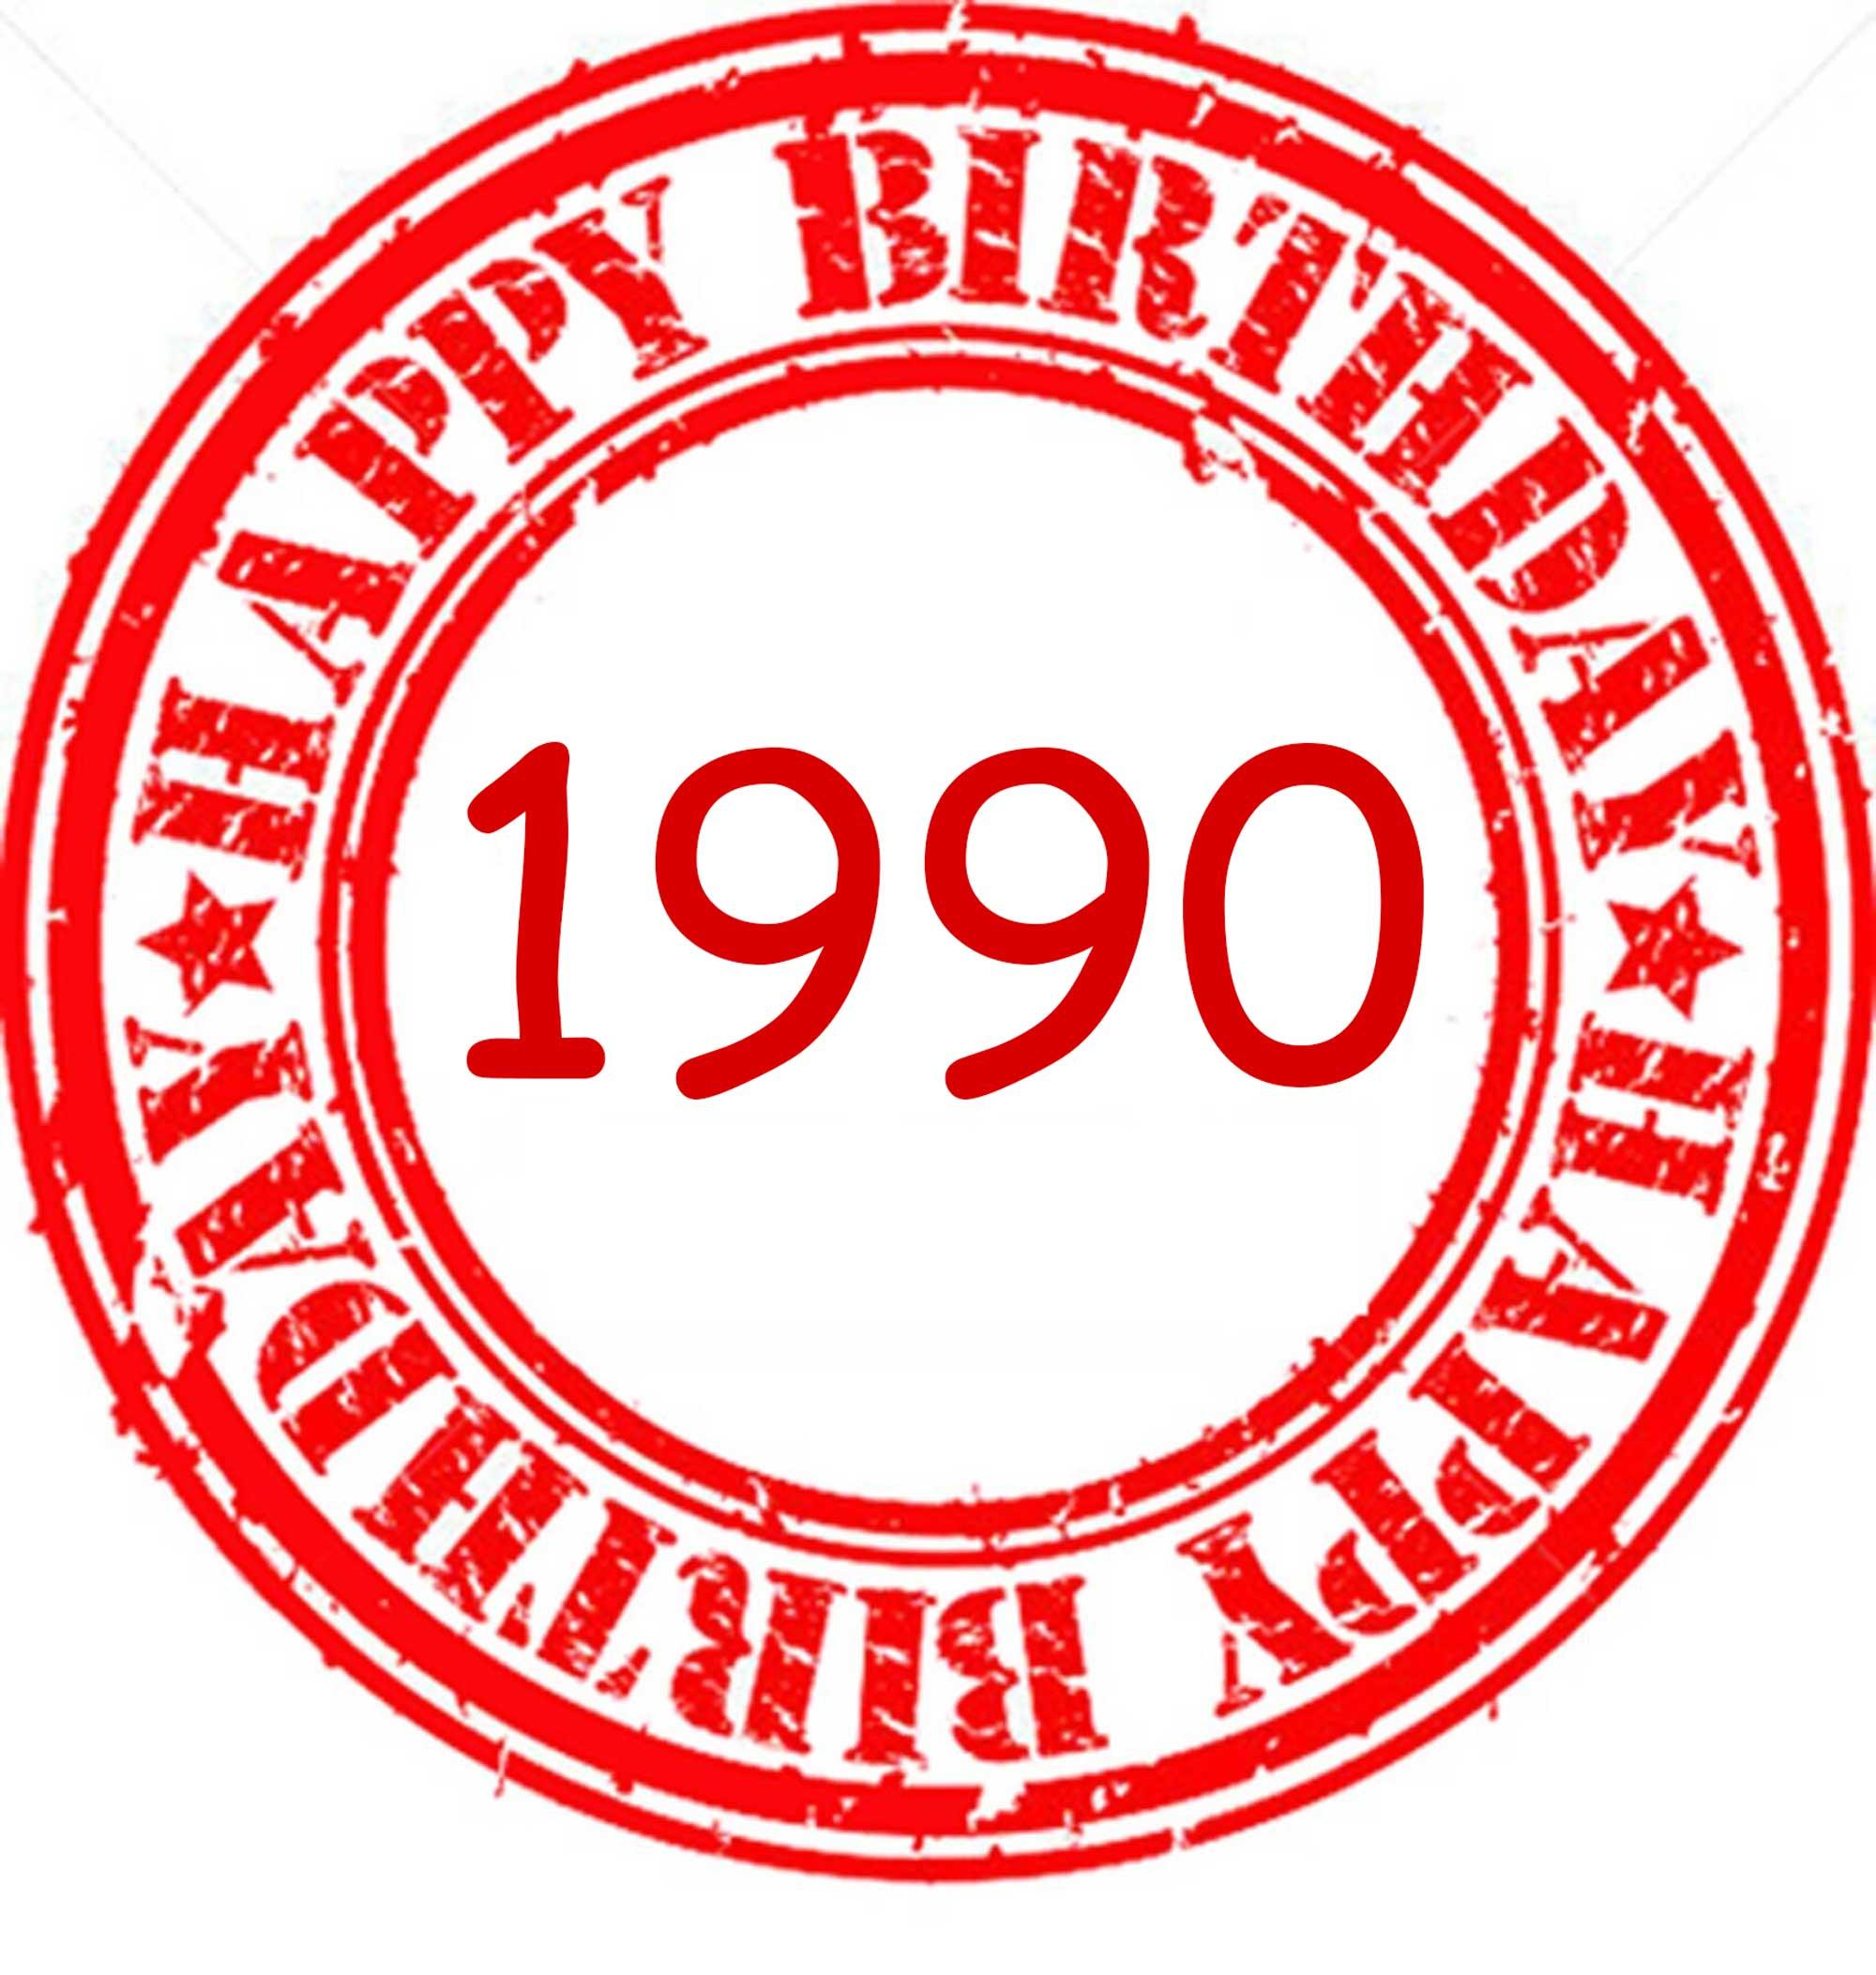 happy birthday 1990